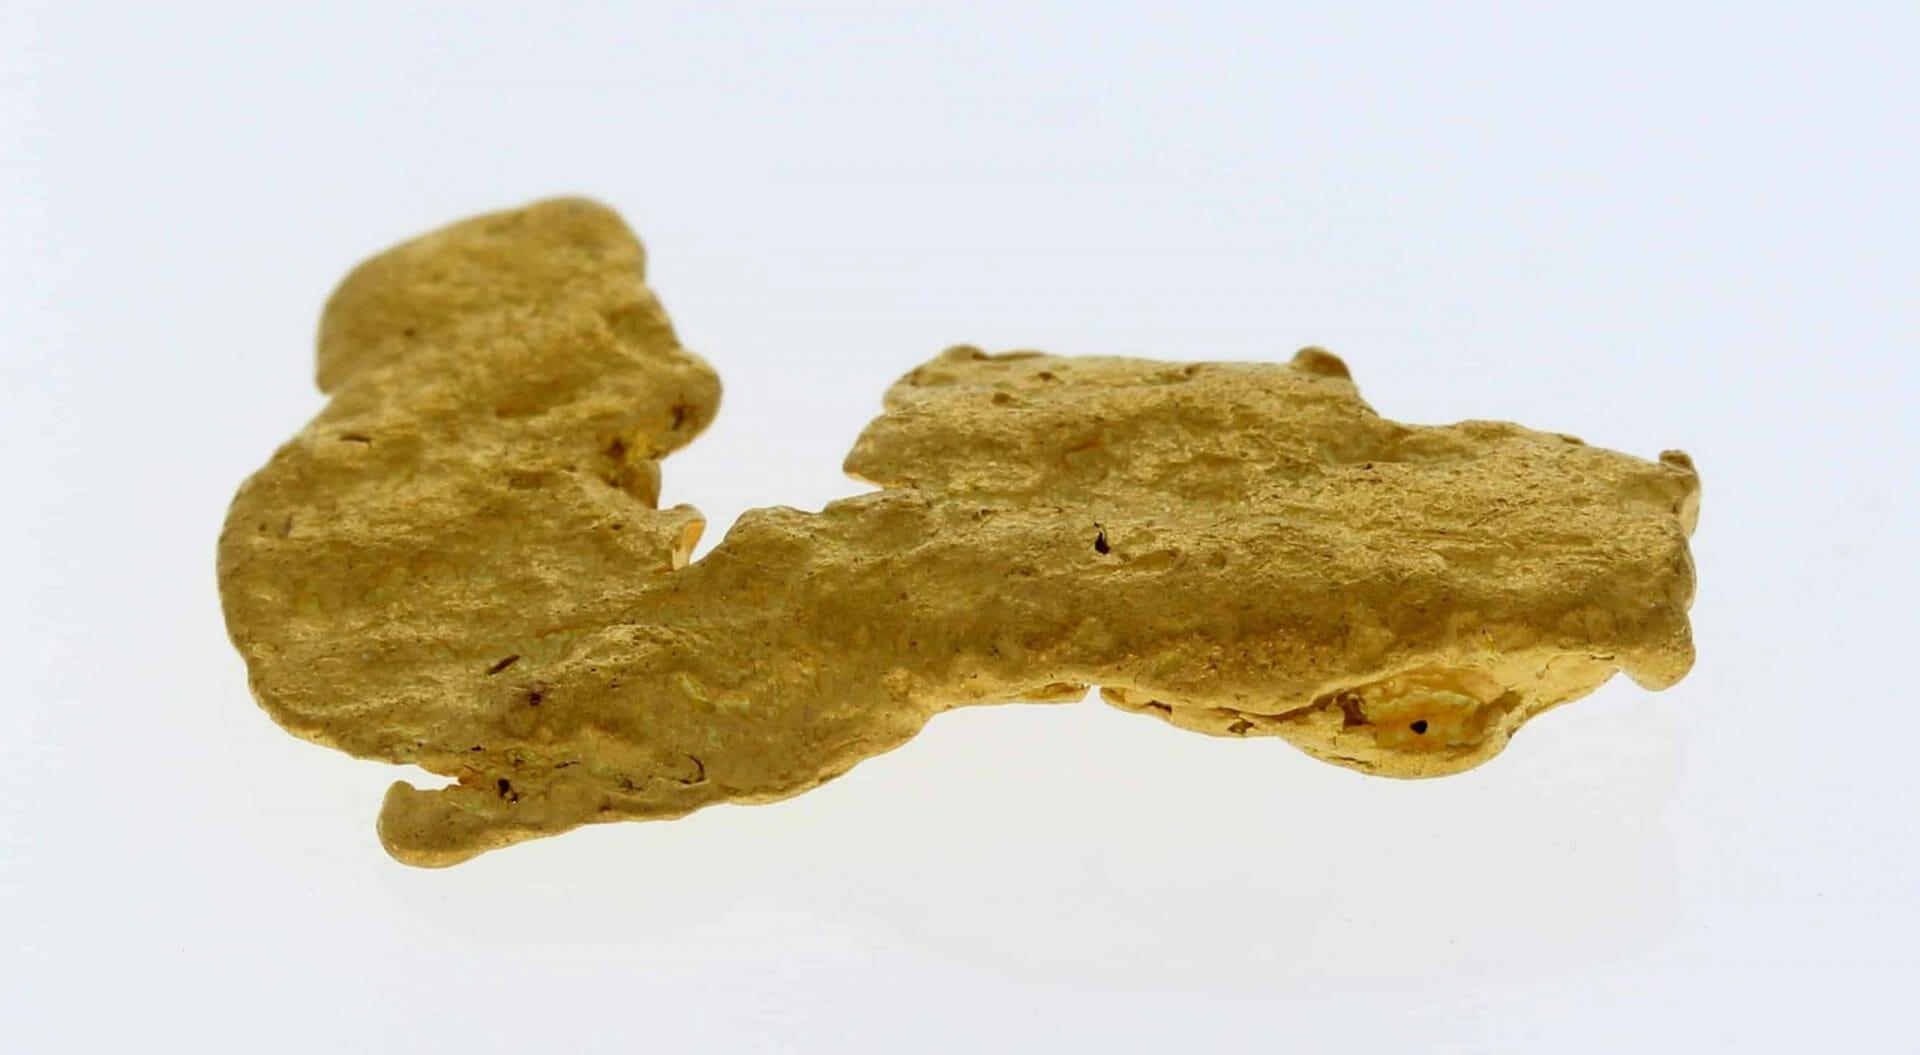 Natural Western Australian Gold Nugget - 4.75g 5